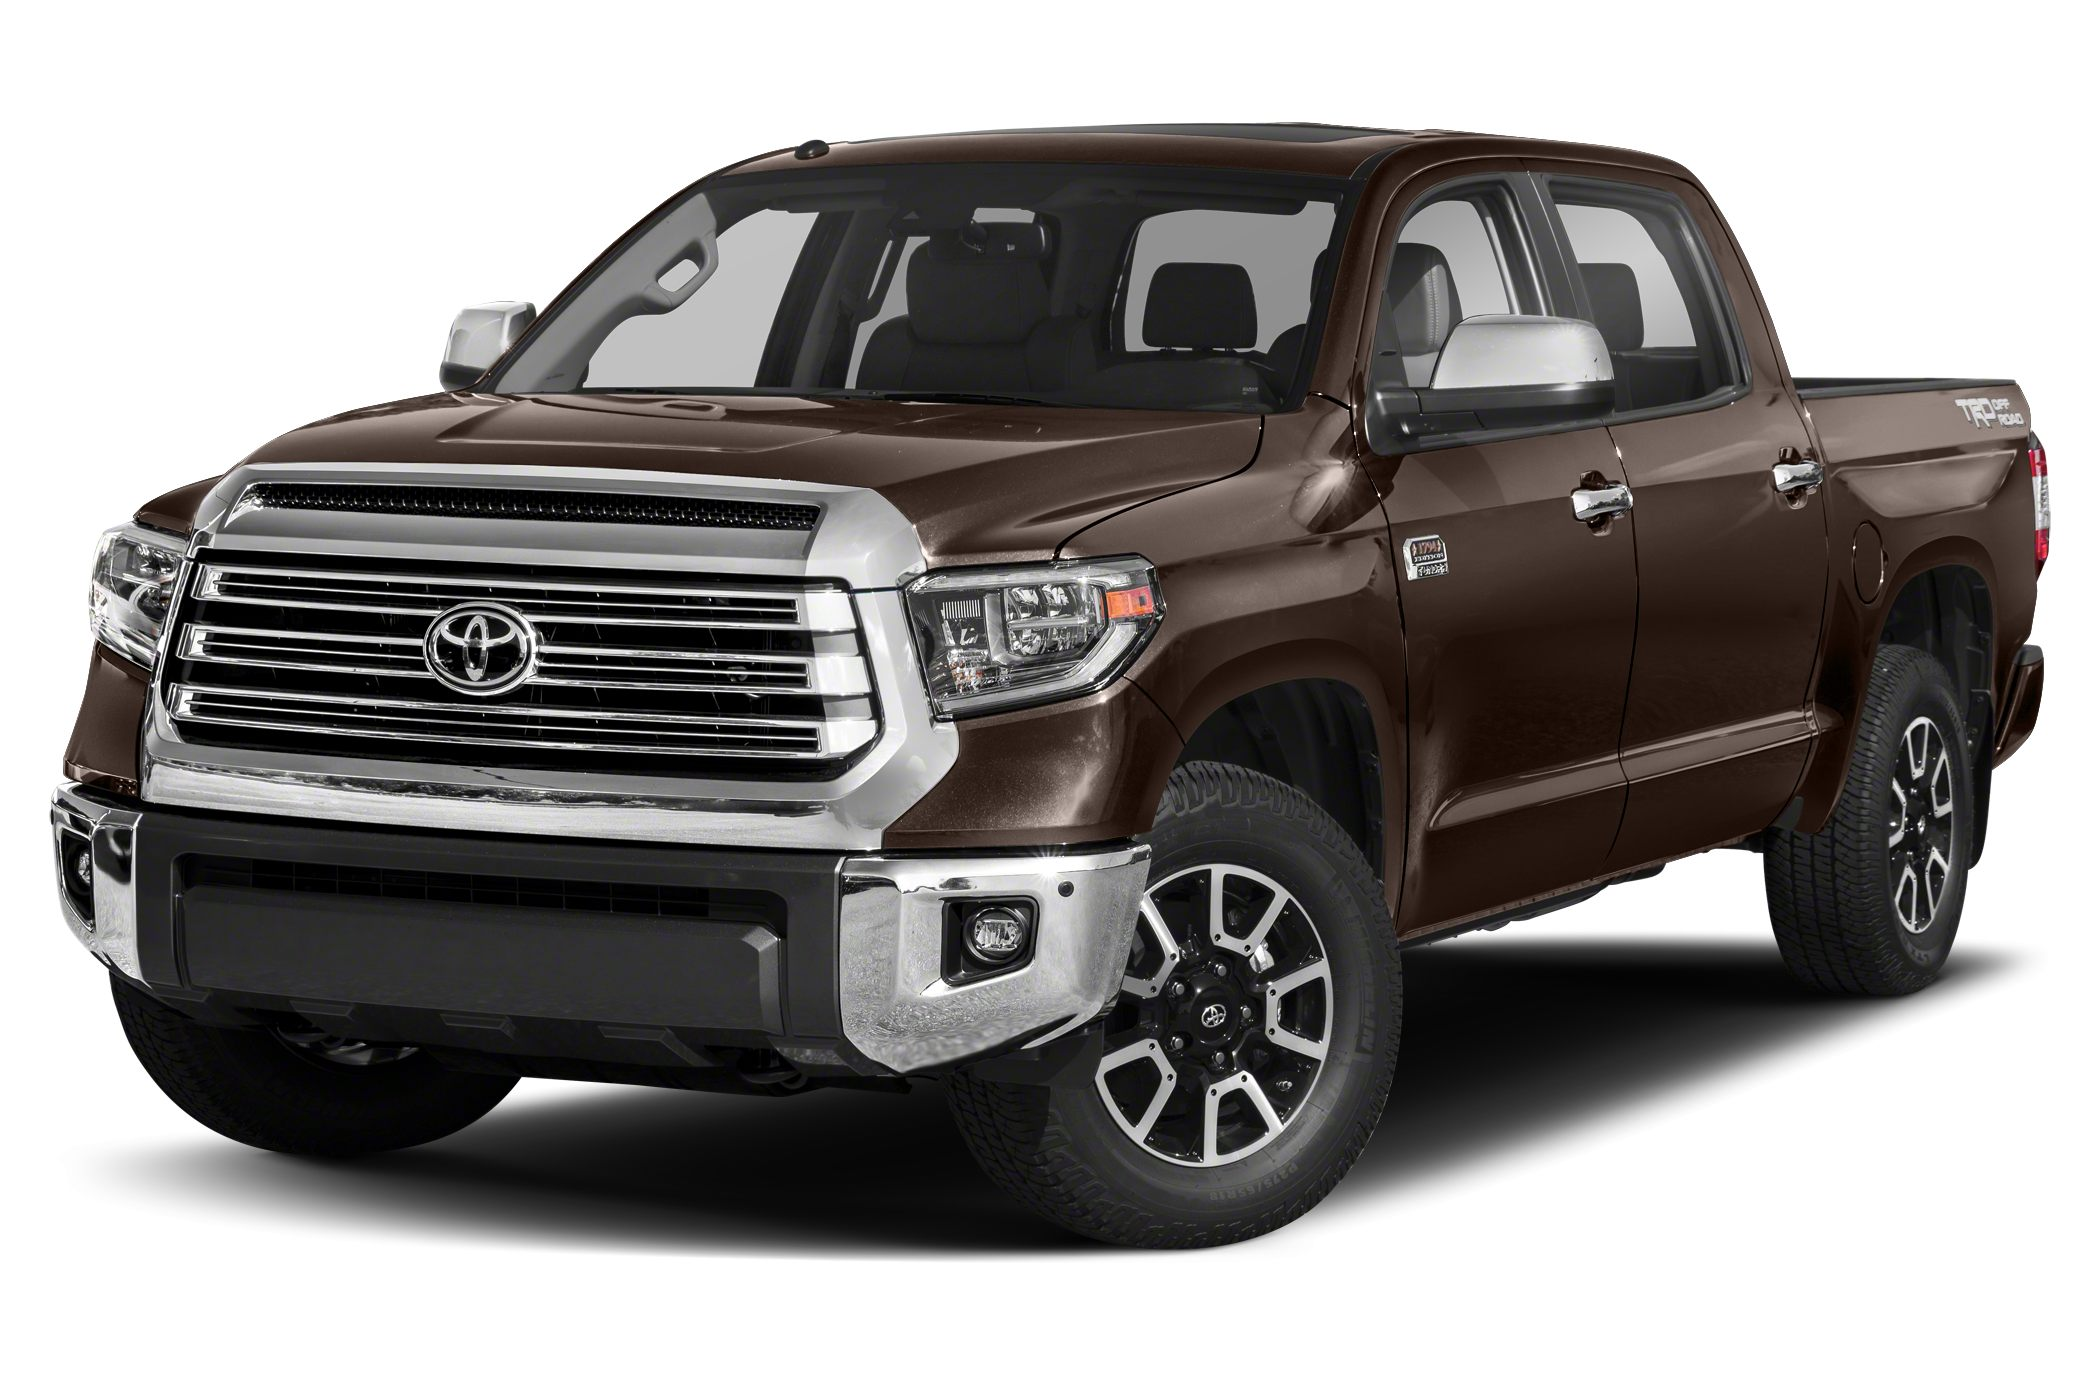 2019 Toyota Tundra 1794 5.7L V8 4x4 CrewMax 5.6 ft. box 145.7 in. WB